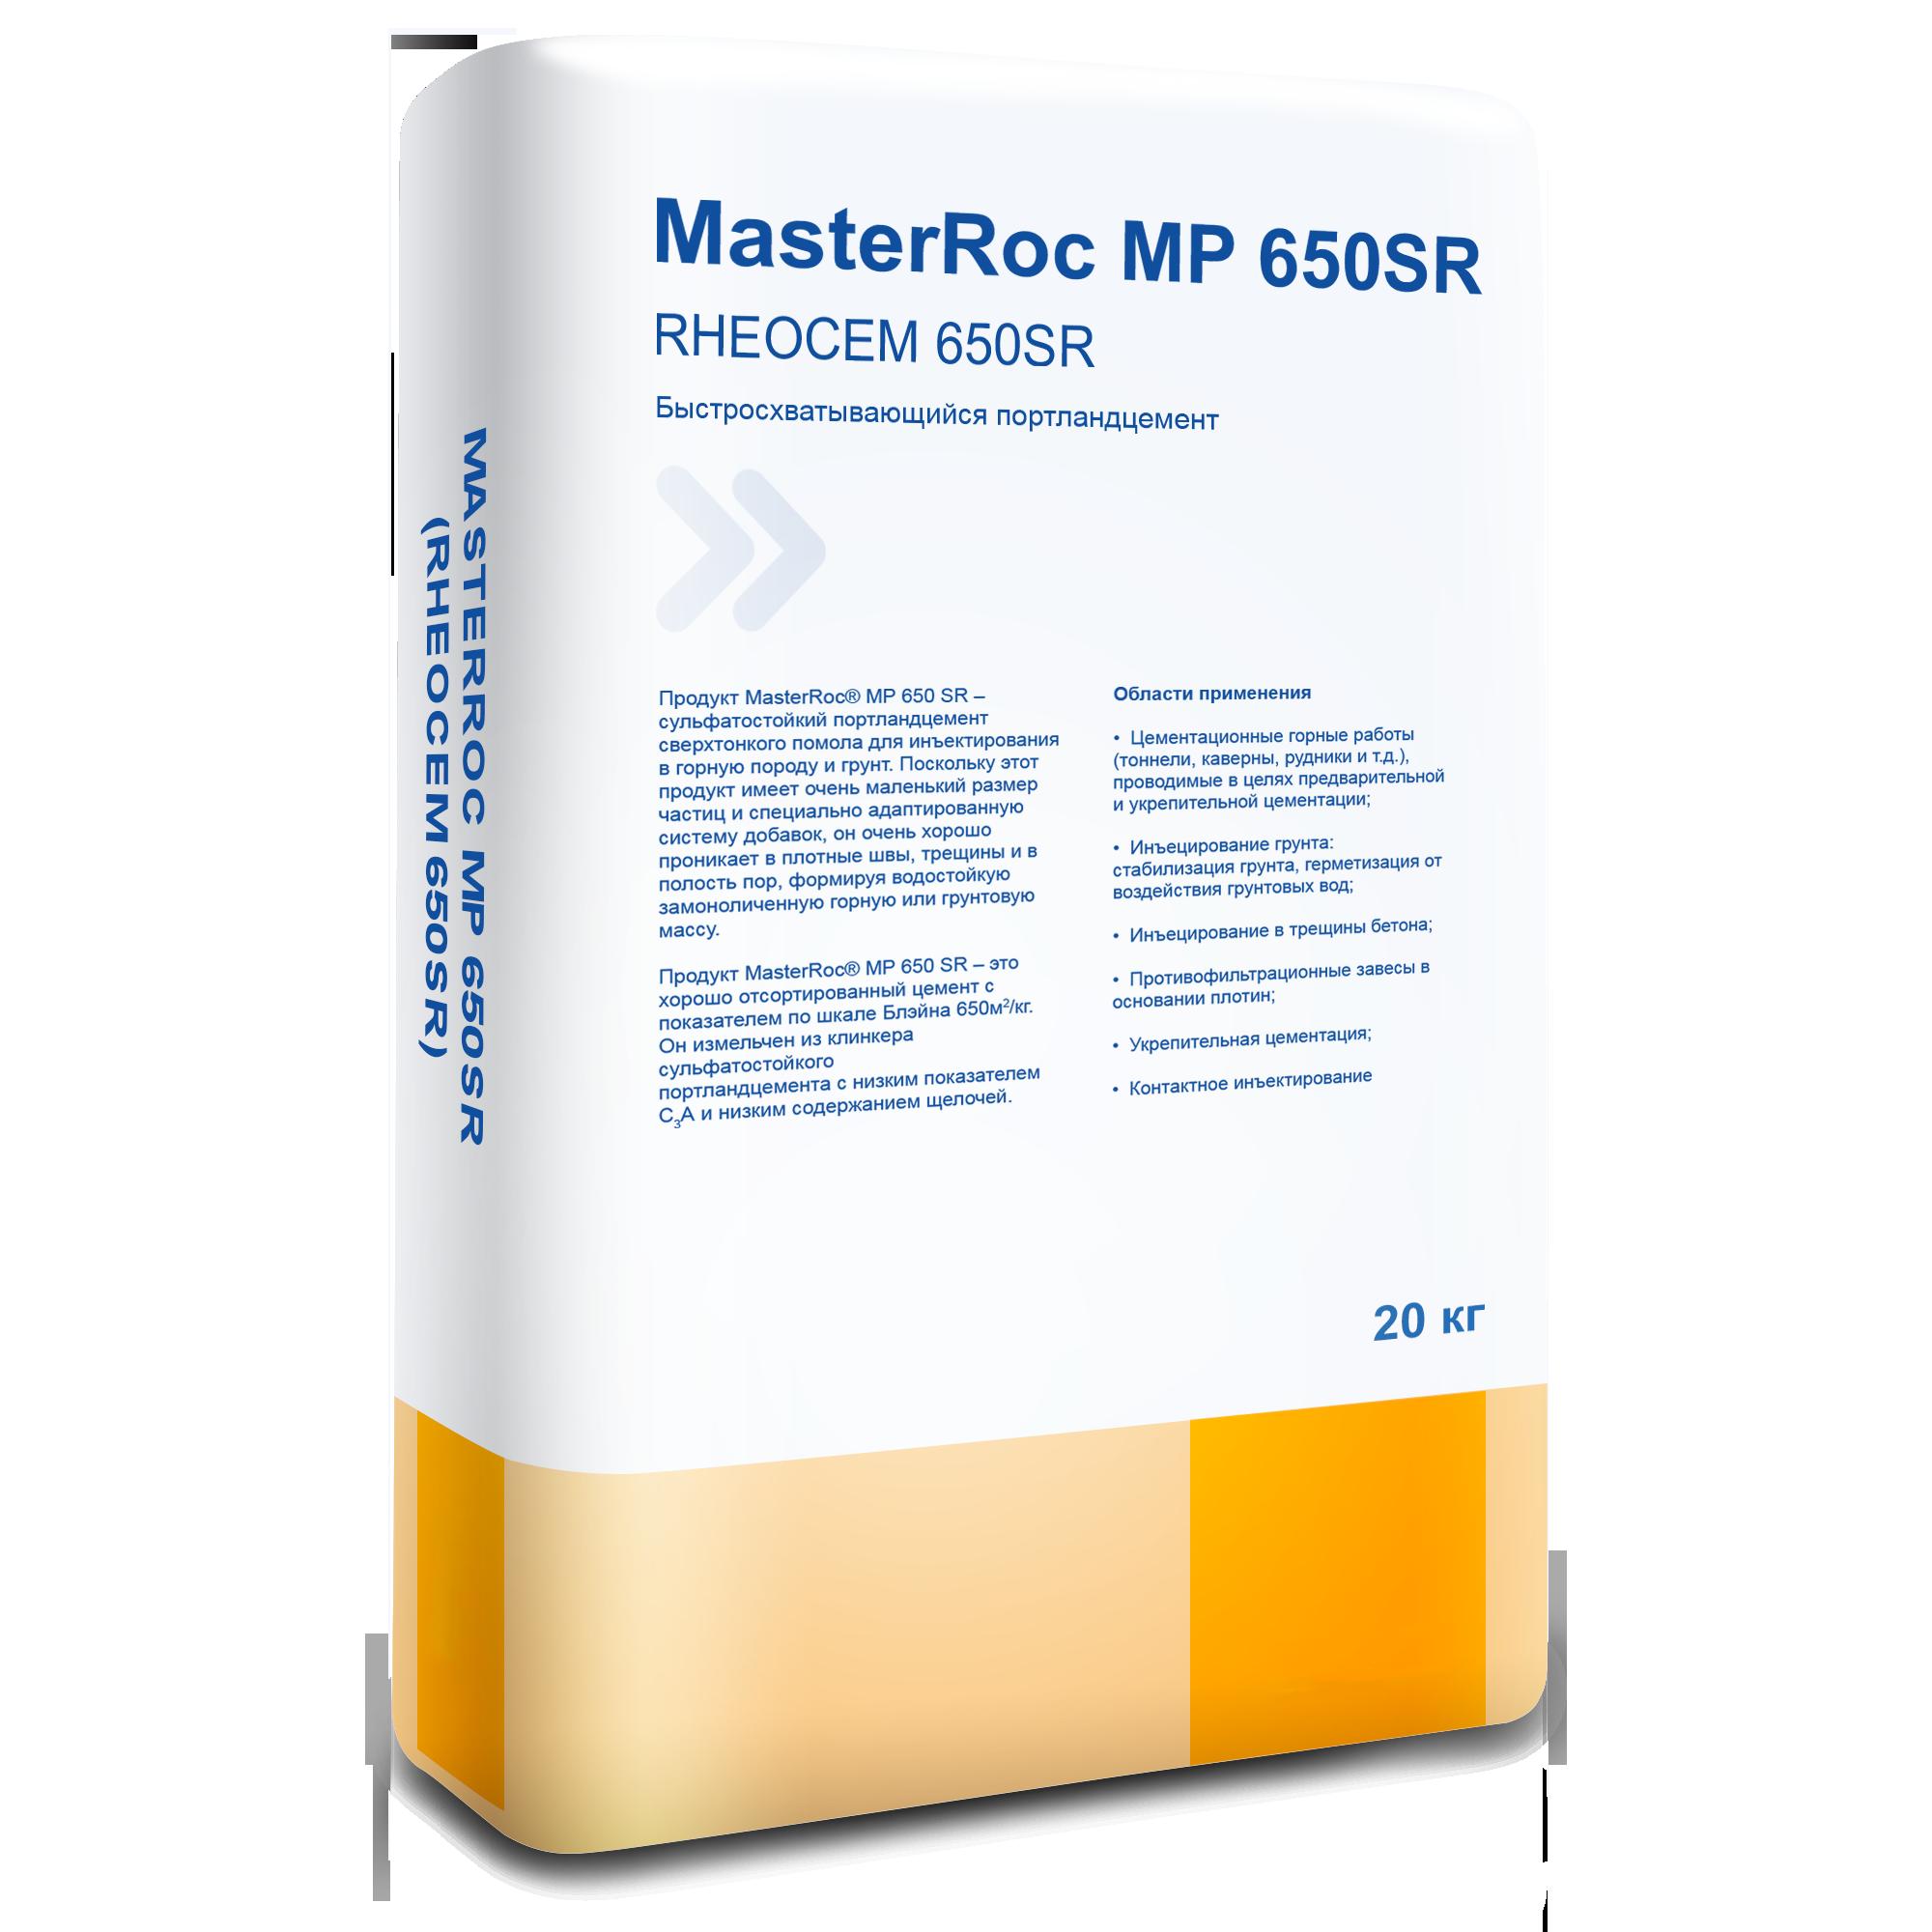 MasterRoc MP 650SR